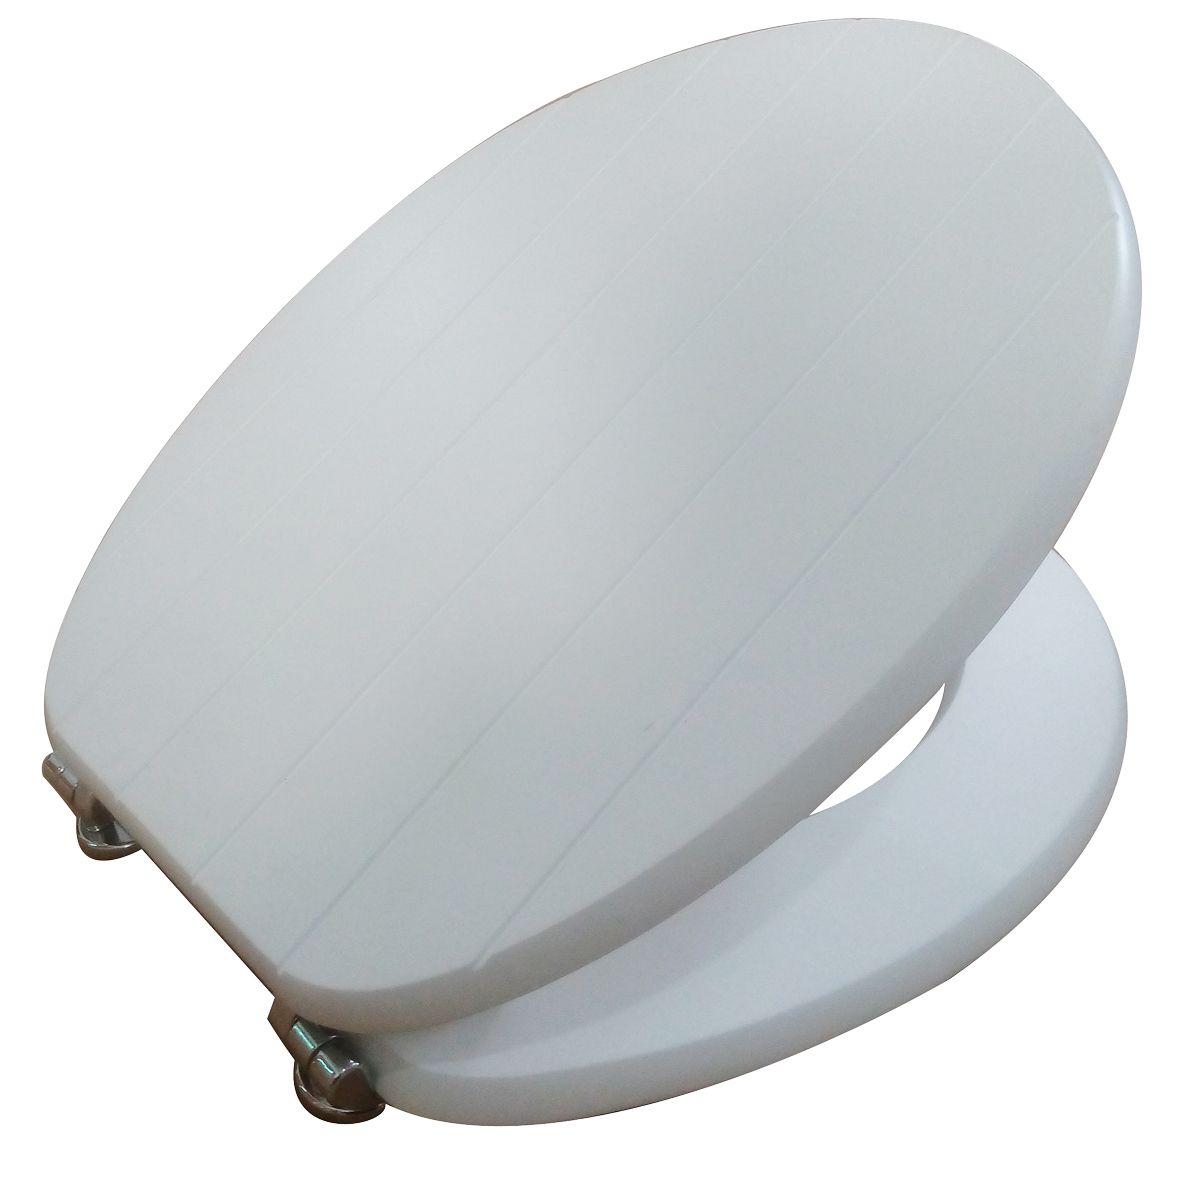 Cooke Lewis Nicolina White Tongue Groove Toilet Seat